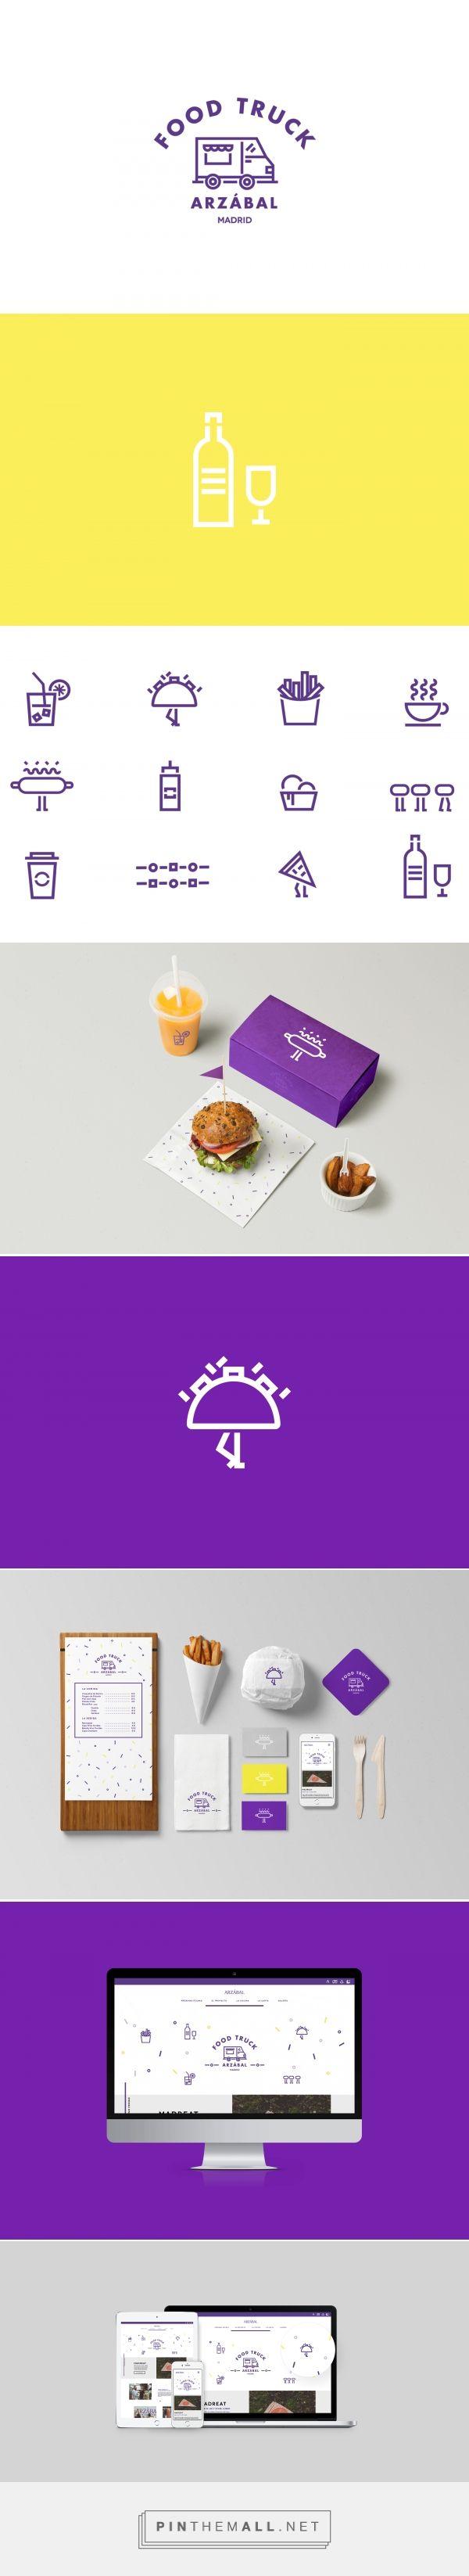 The Woork Co › Arzábal Food Truck Branding & Website - created via https://pinthemall.net